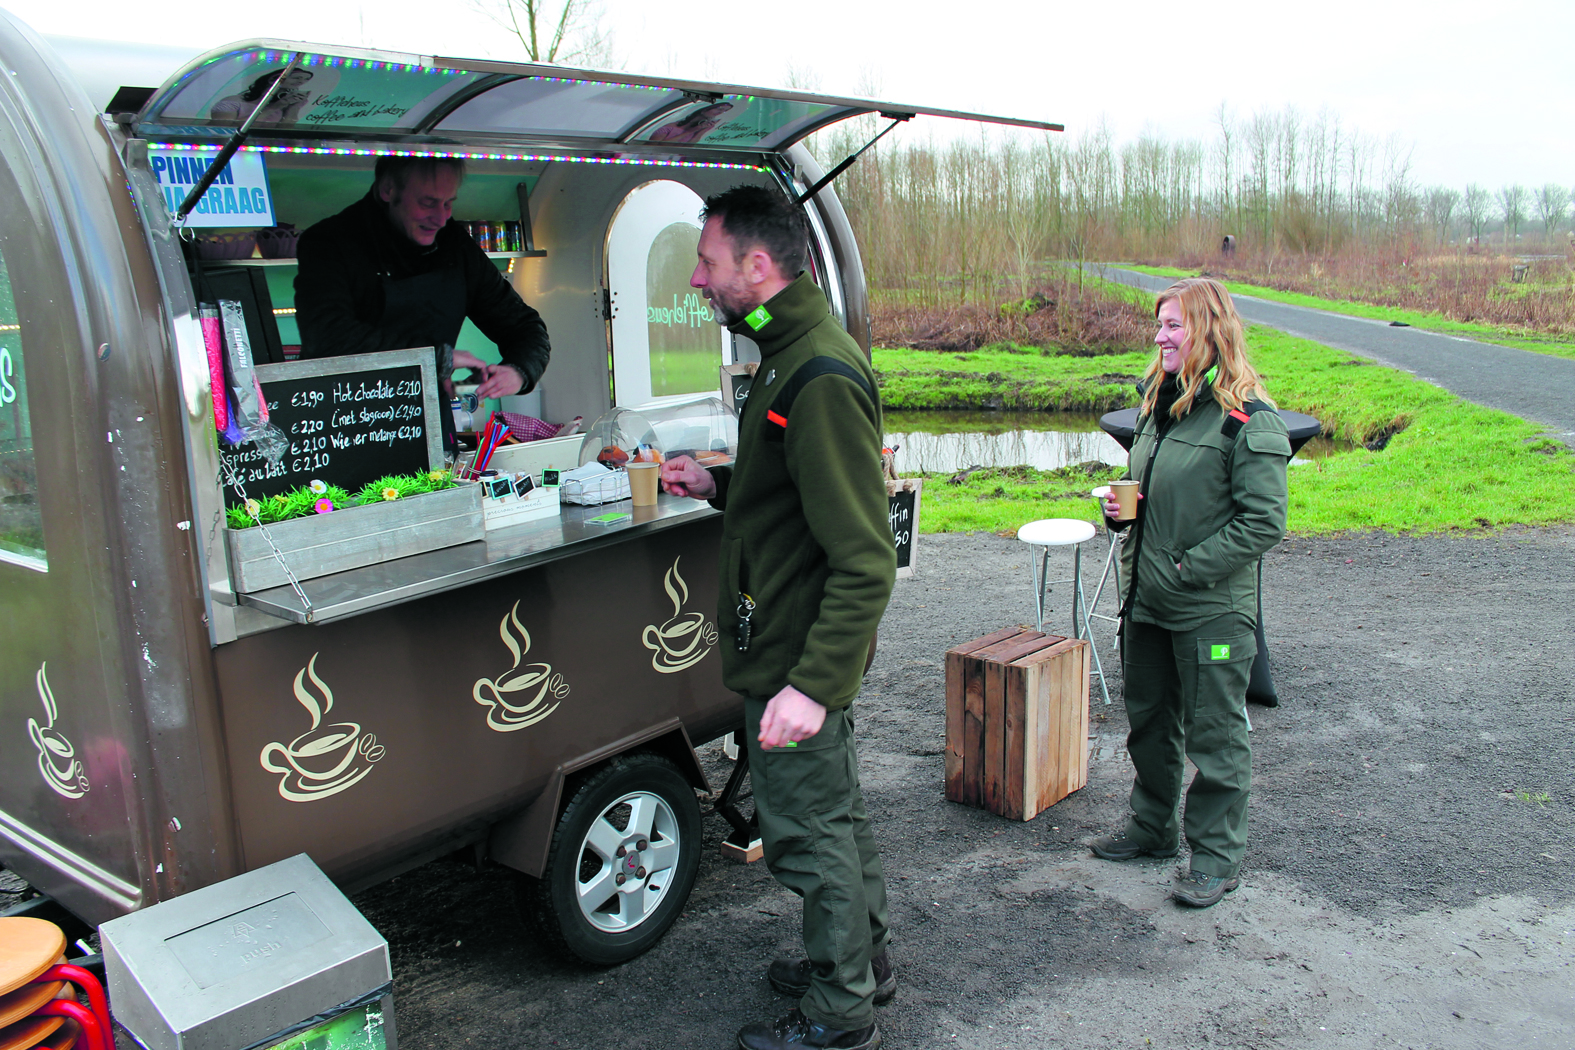 <p>Doek valt voor Koffieheus in Purmerbos</p>